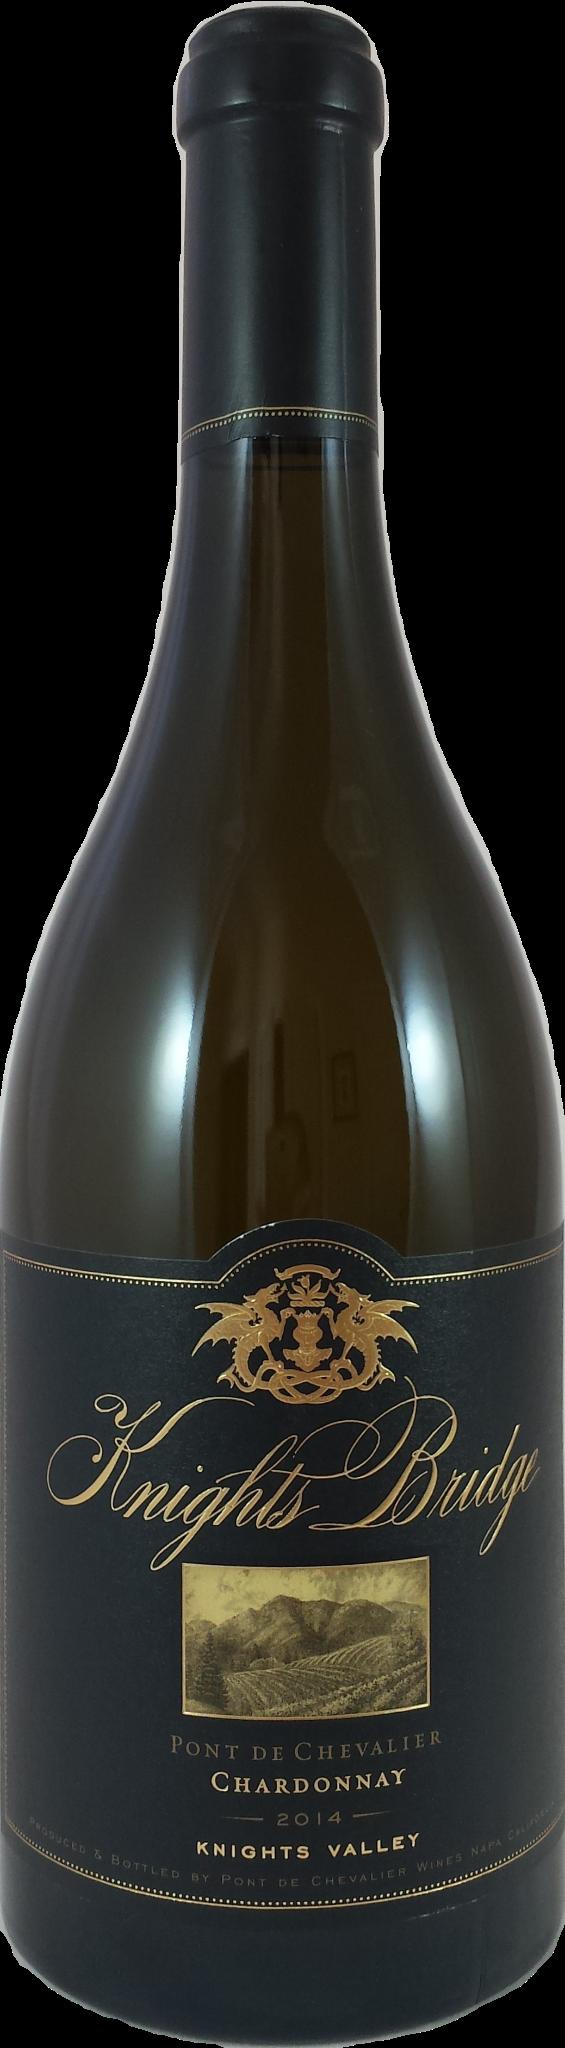 knightsbridge-14chardonnay-bottle1-1-1-1